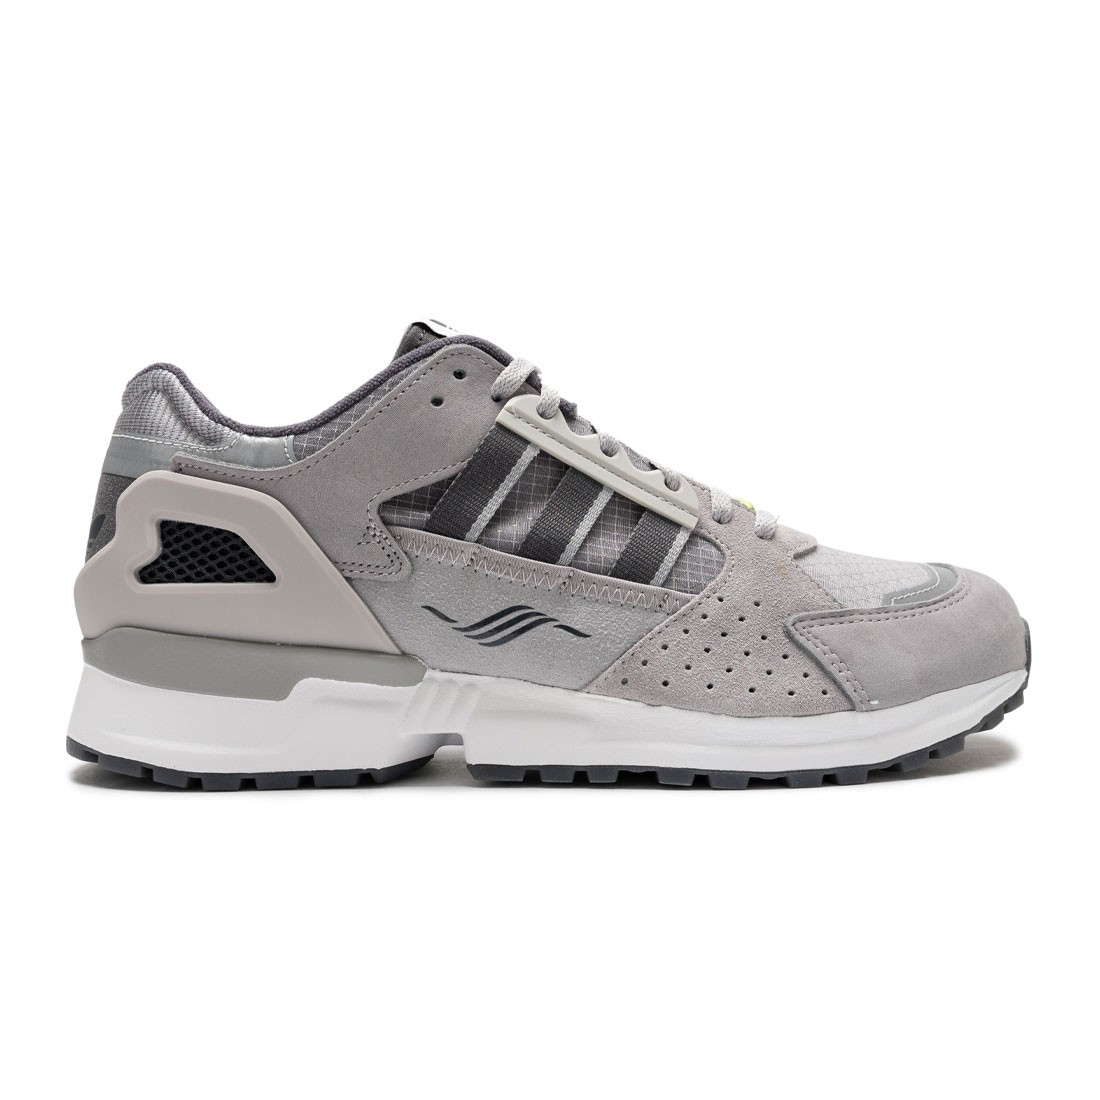 Adidas Men ZX 10,000 C (gray / clear grey / core black)